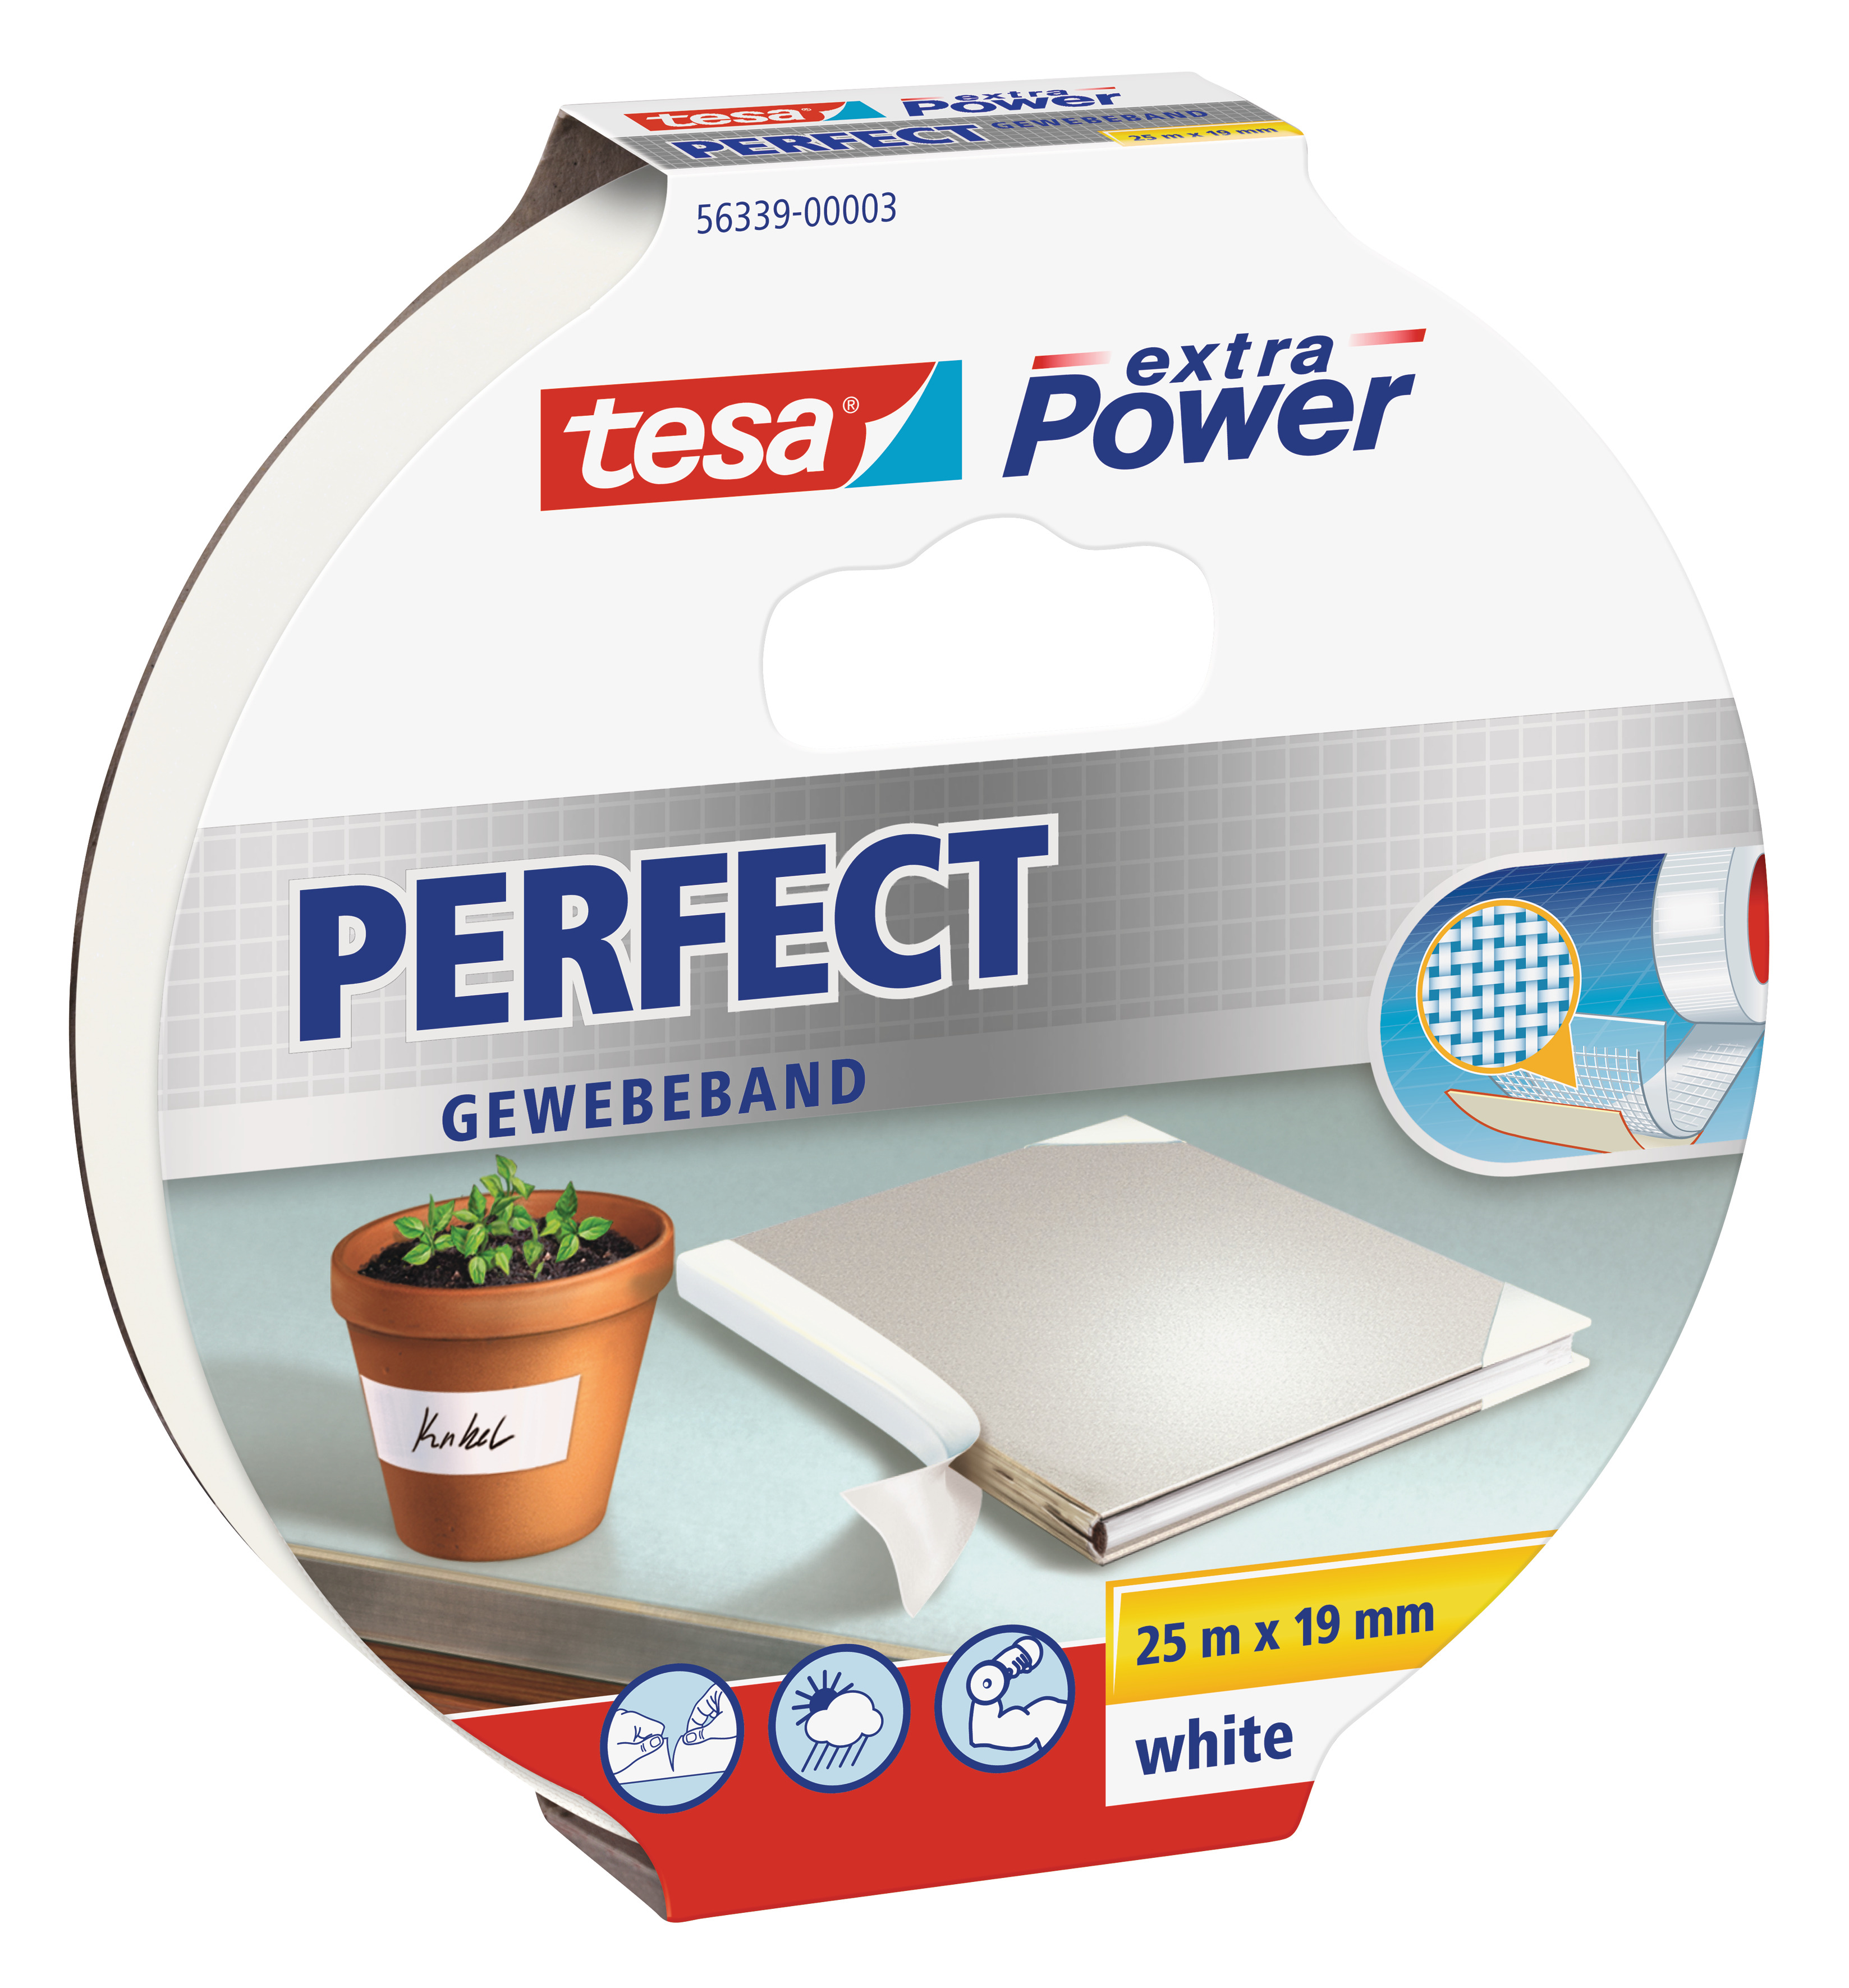 GP: 0,49 EUR/m tesa extra Power Perfect Gewebeband weiß 25m x 19mm